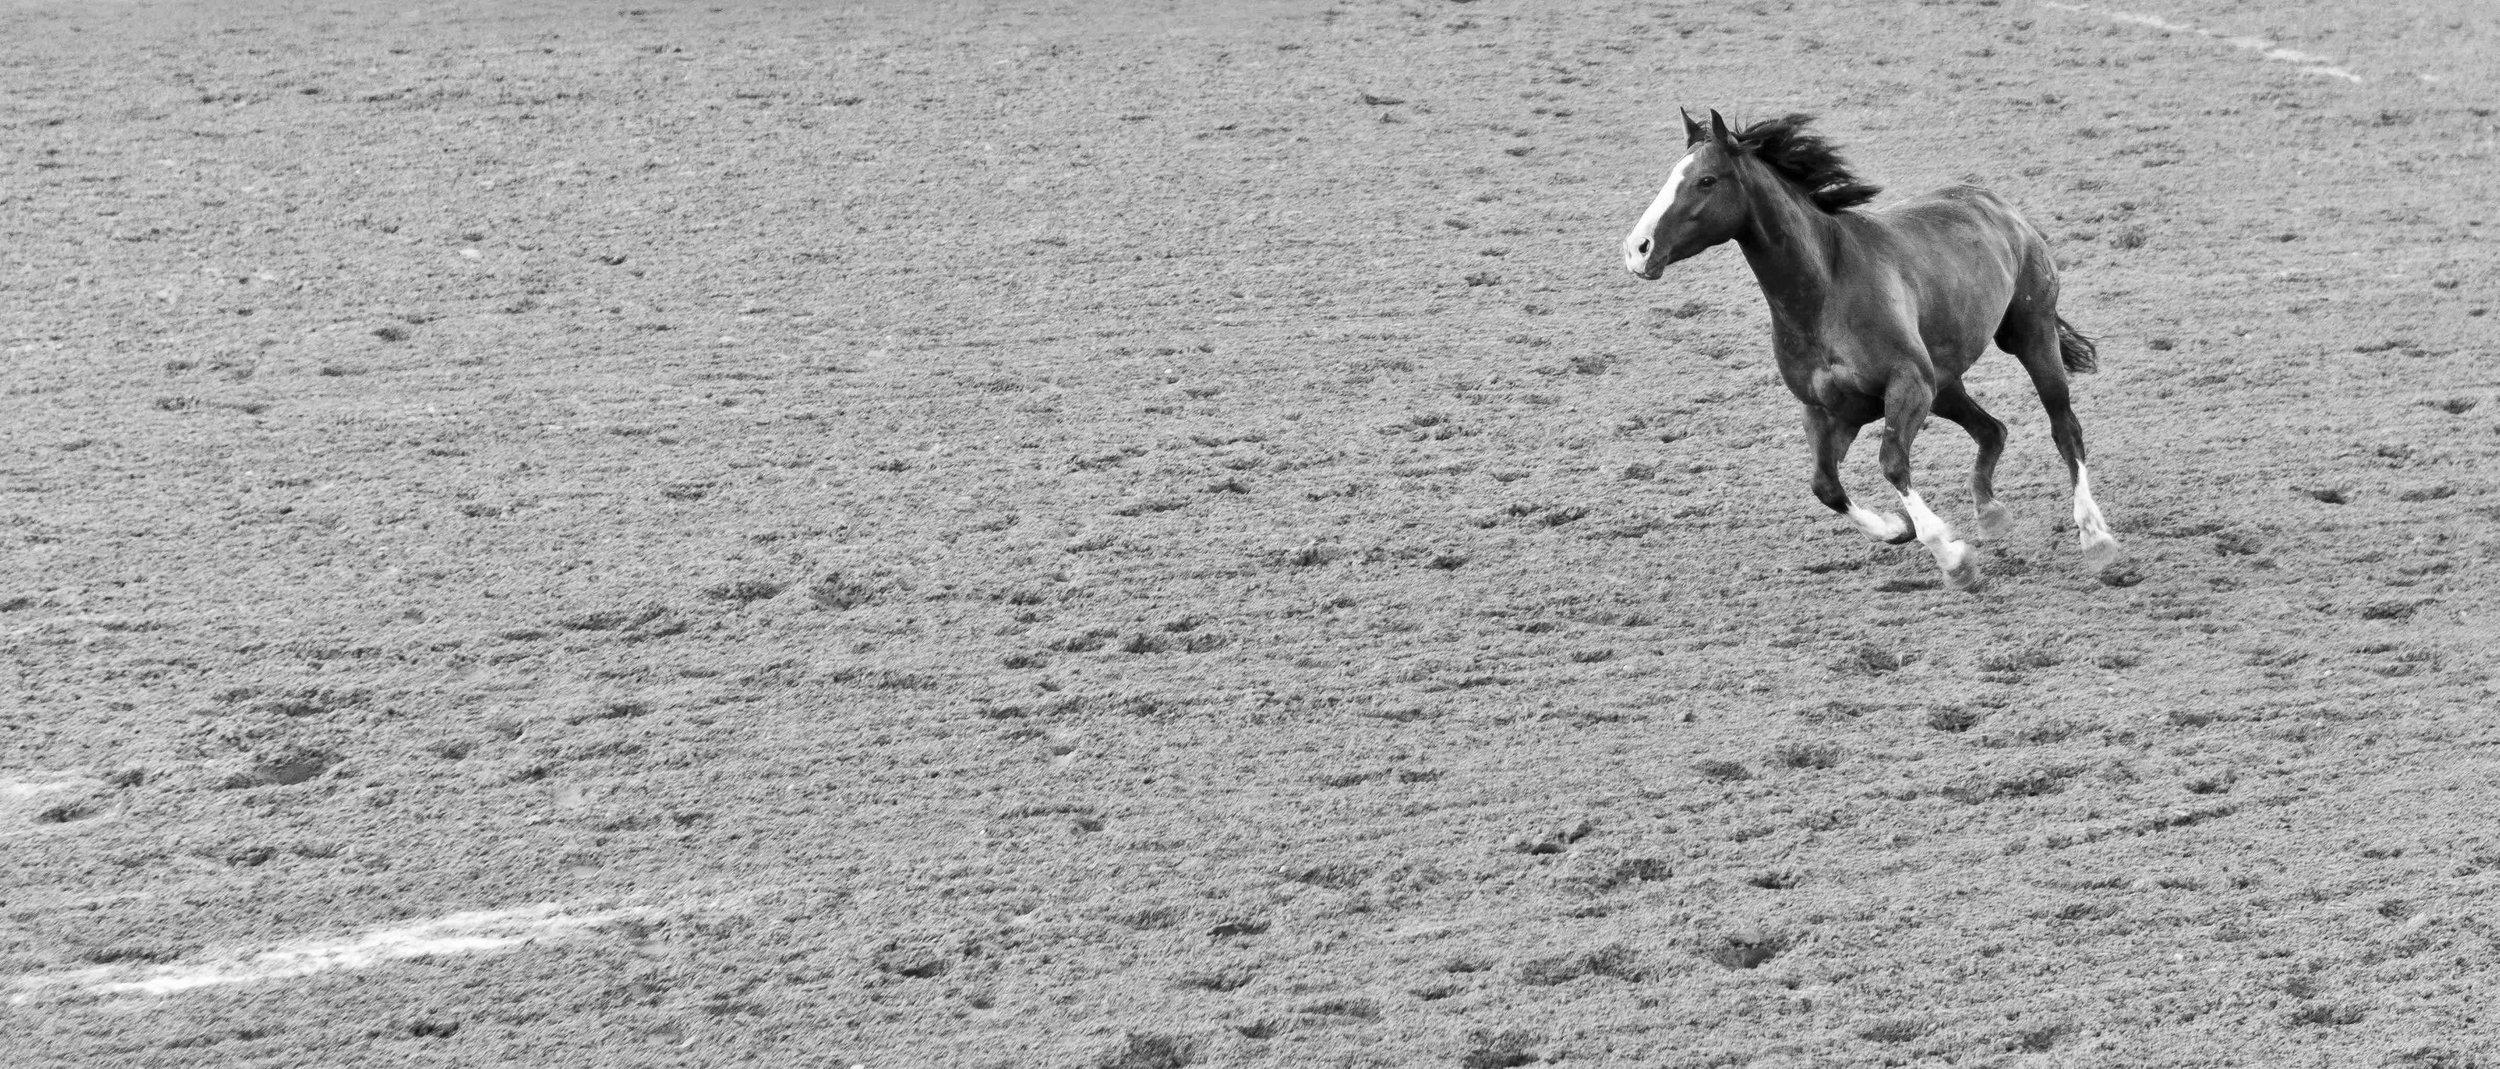 Pony loose